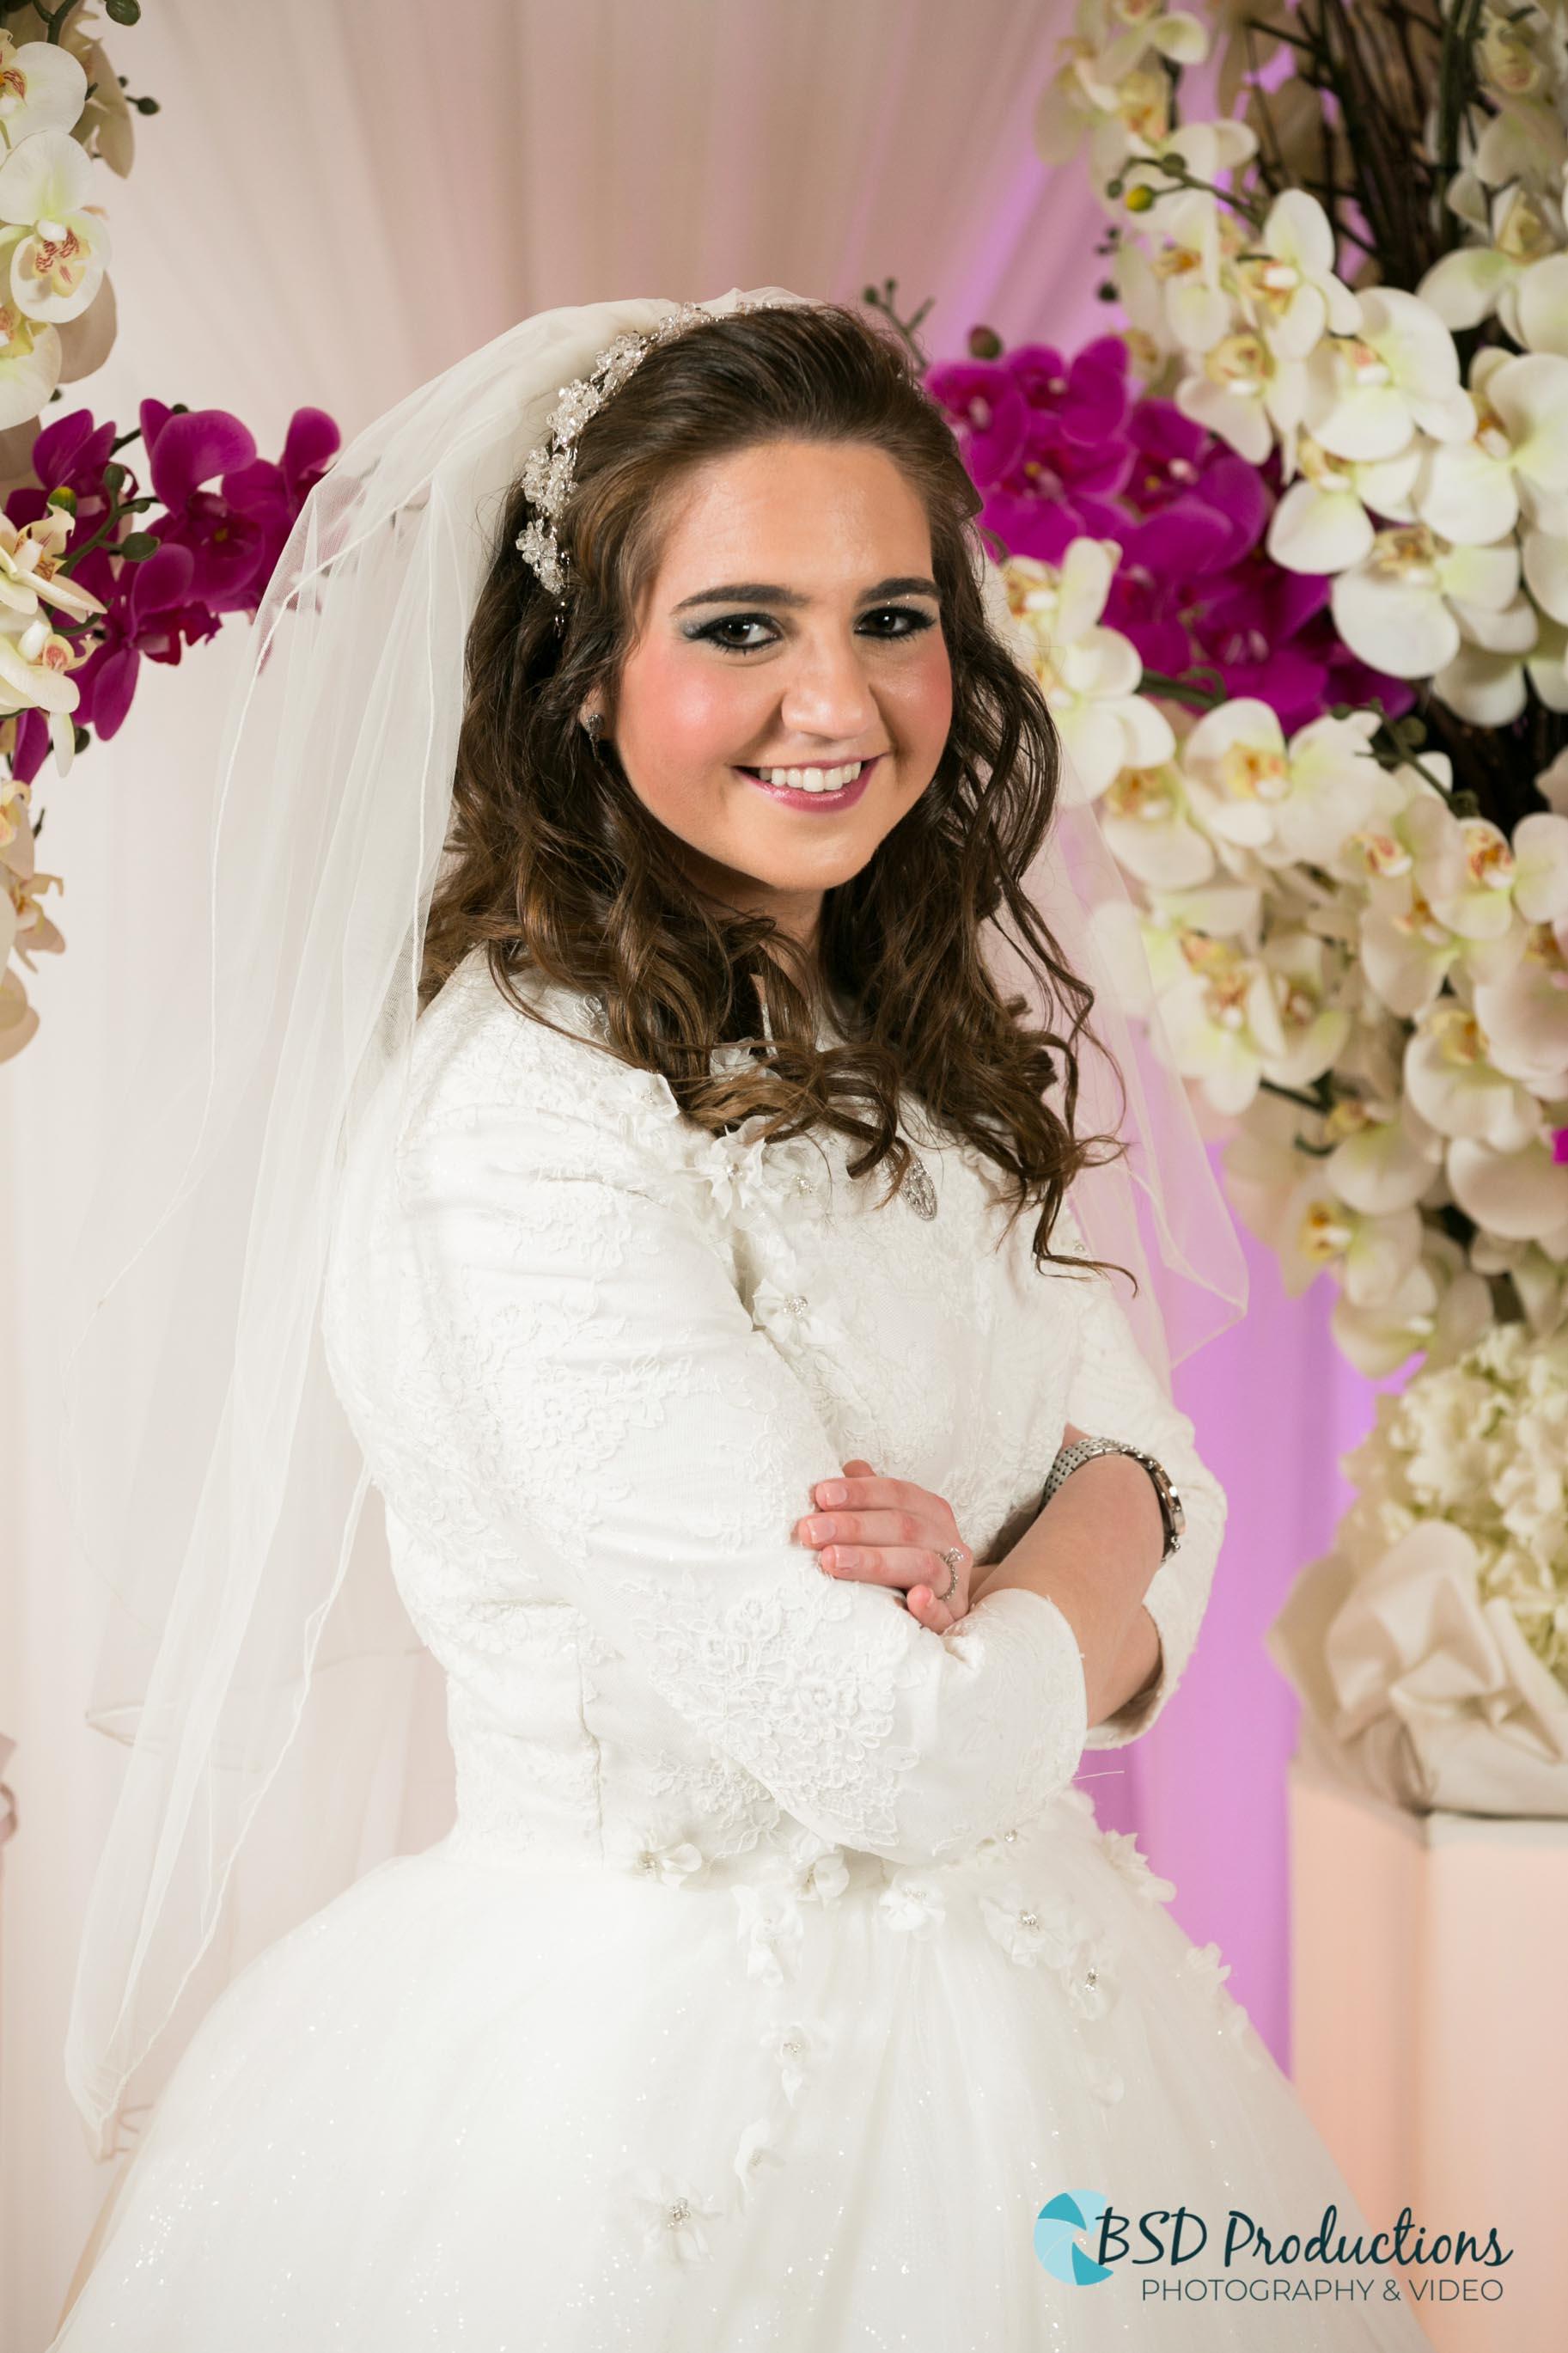 UH5A8342 Wedding – BSD Prodcutions Photography